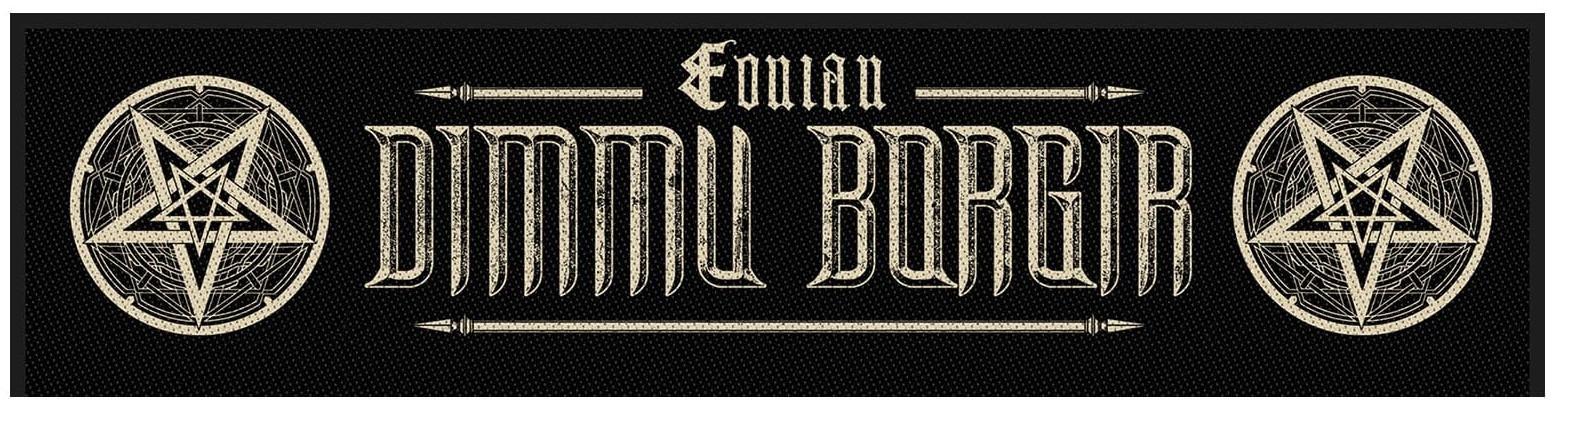 Dimmu Borgir 'Eonian' Superstrip